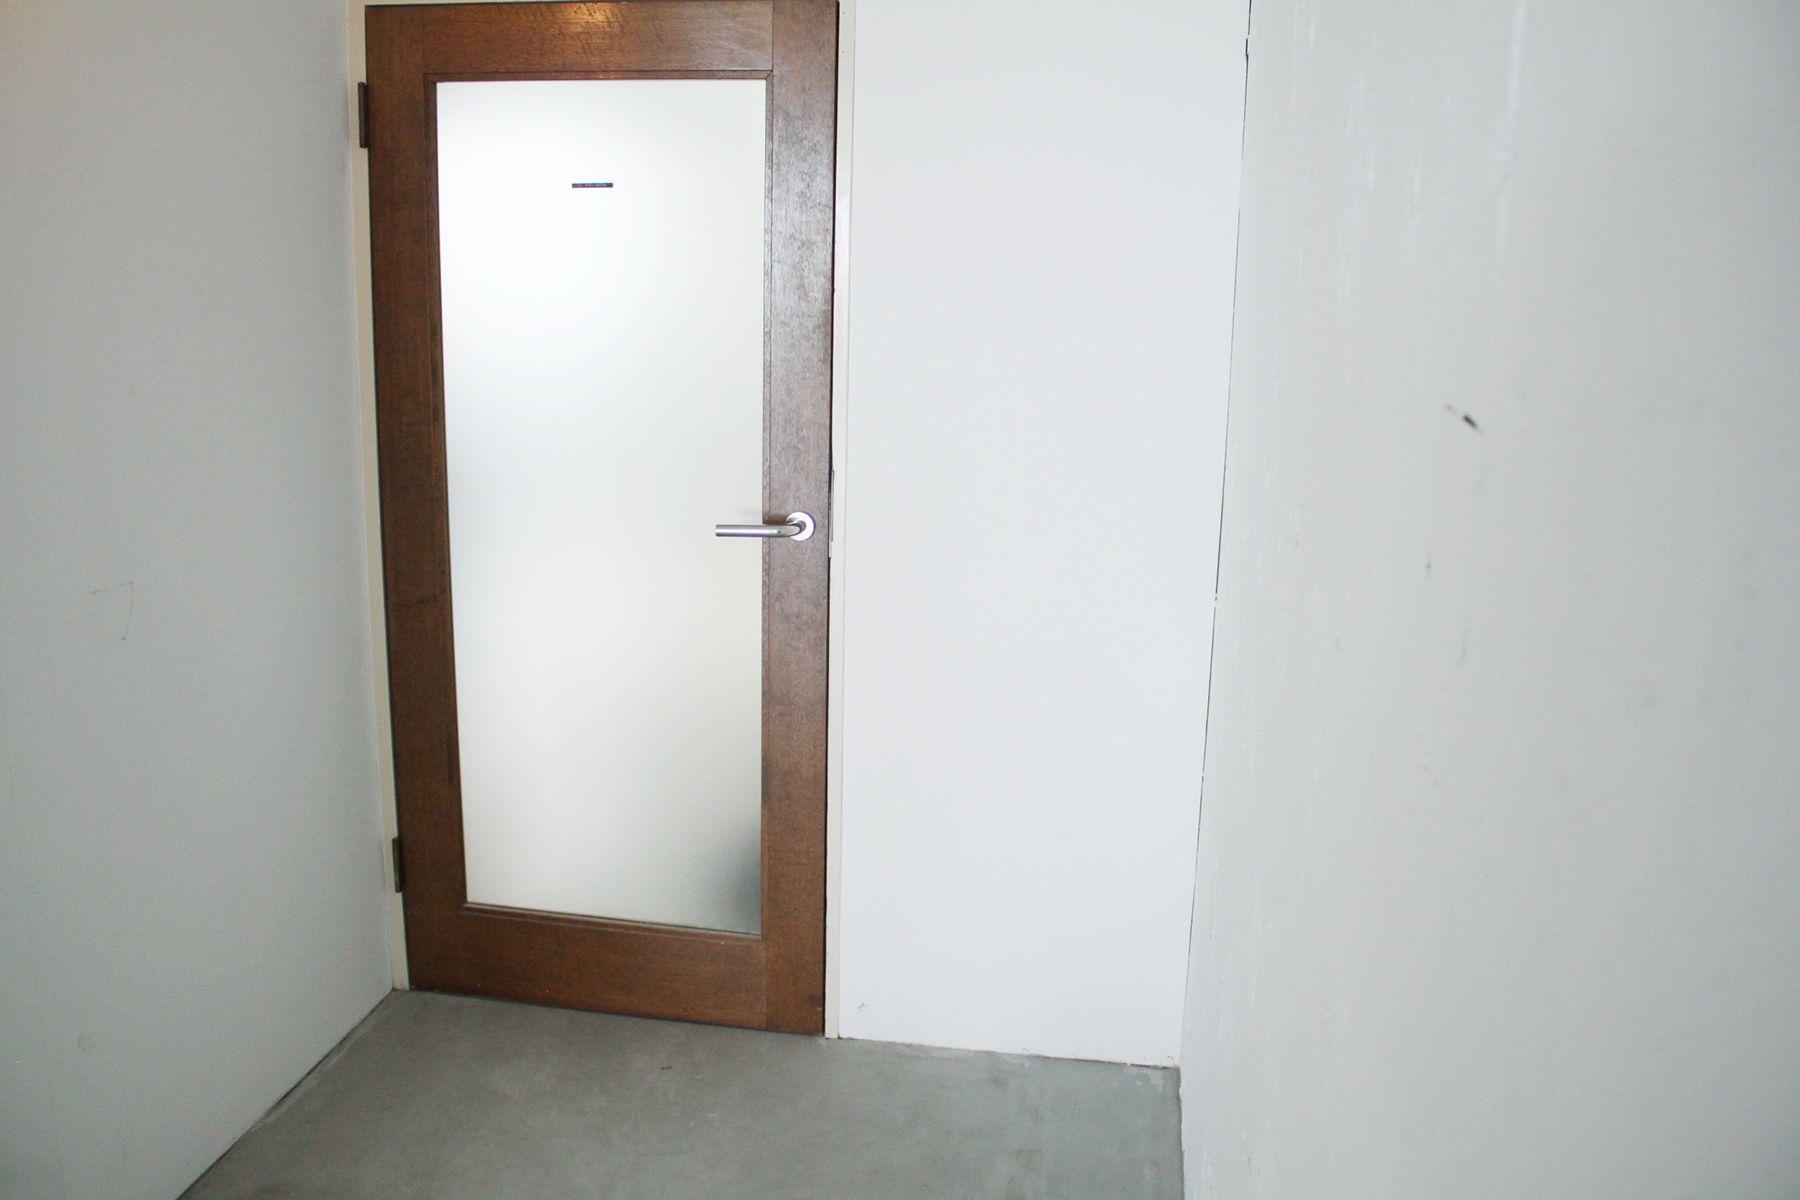 Atelier401(アトリエ401)入り口